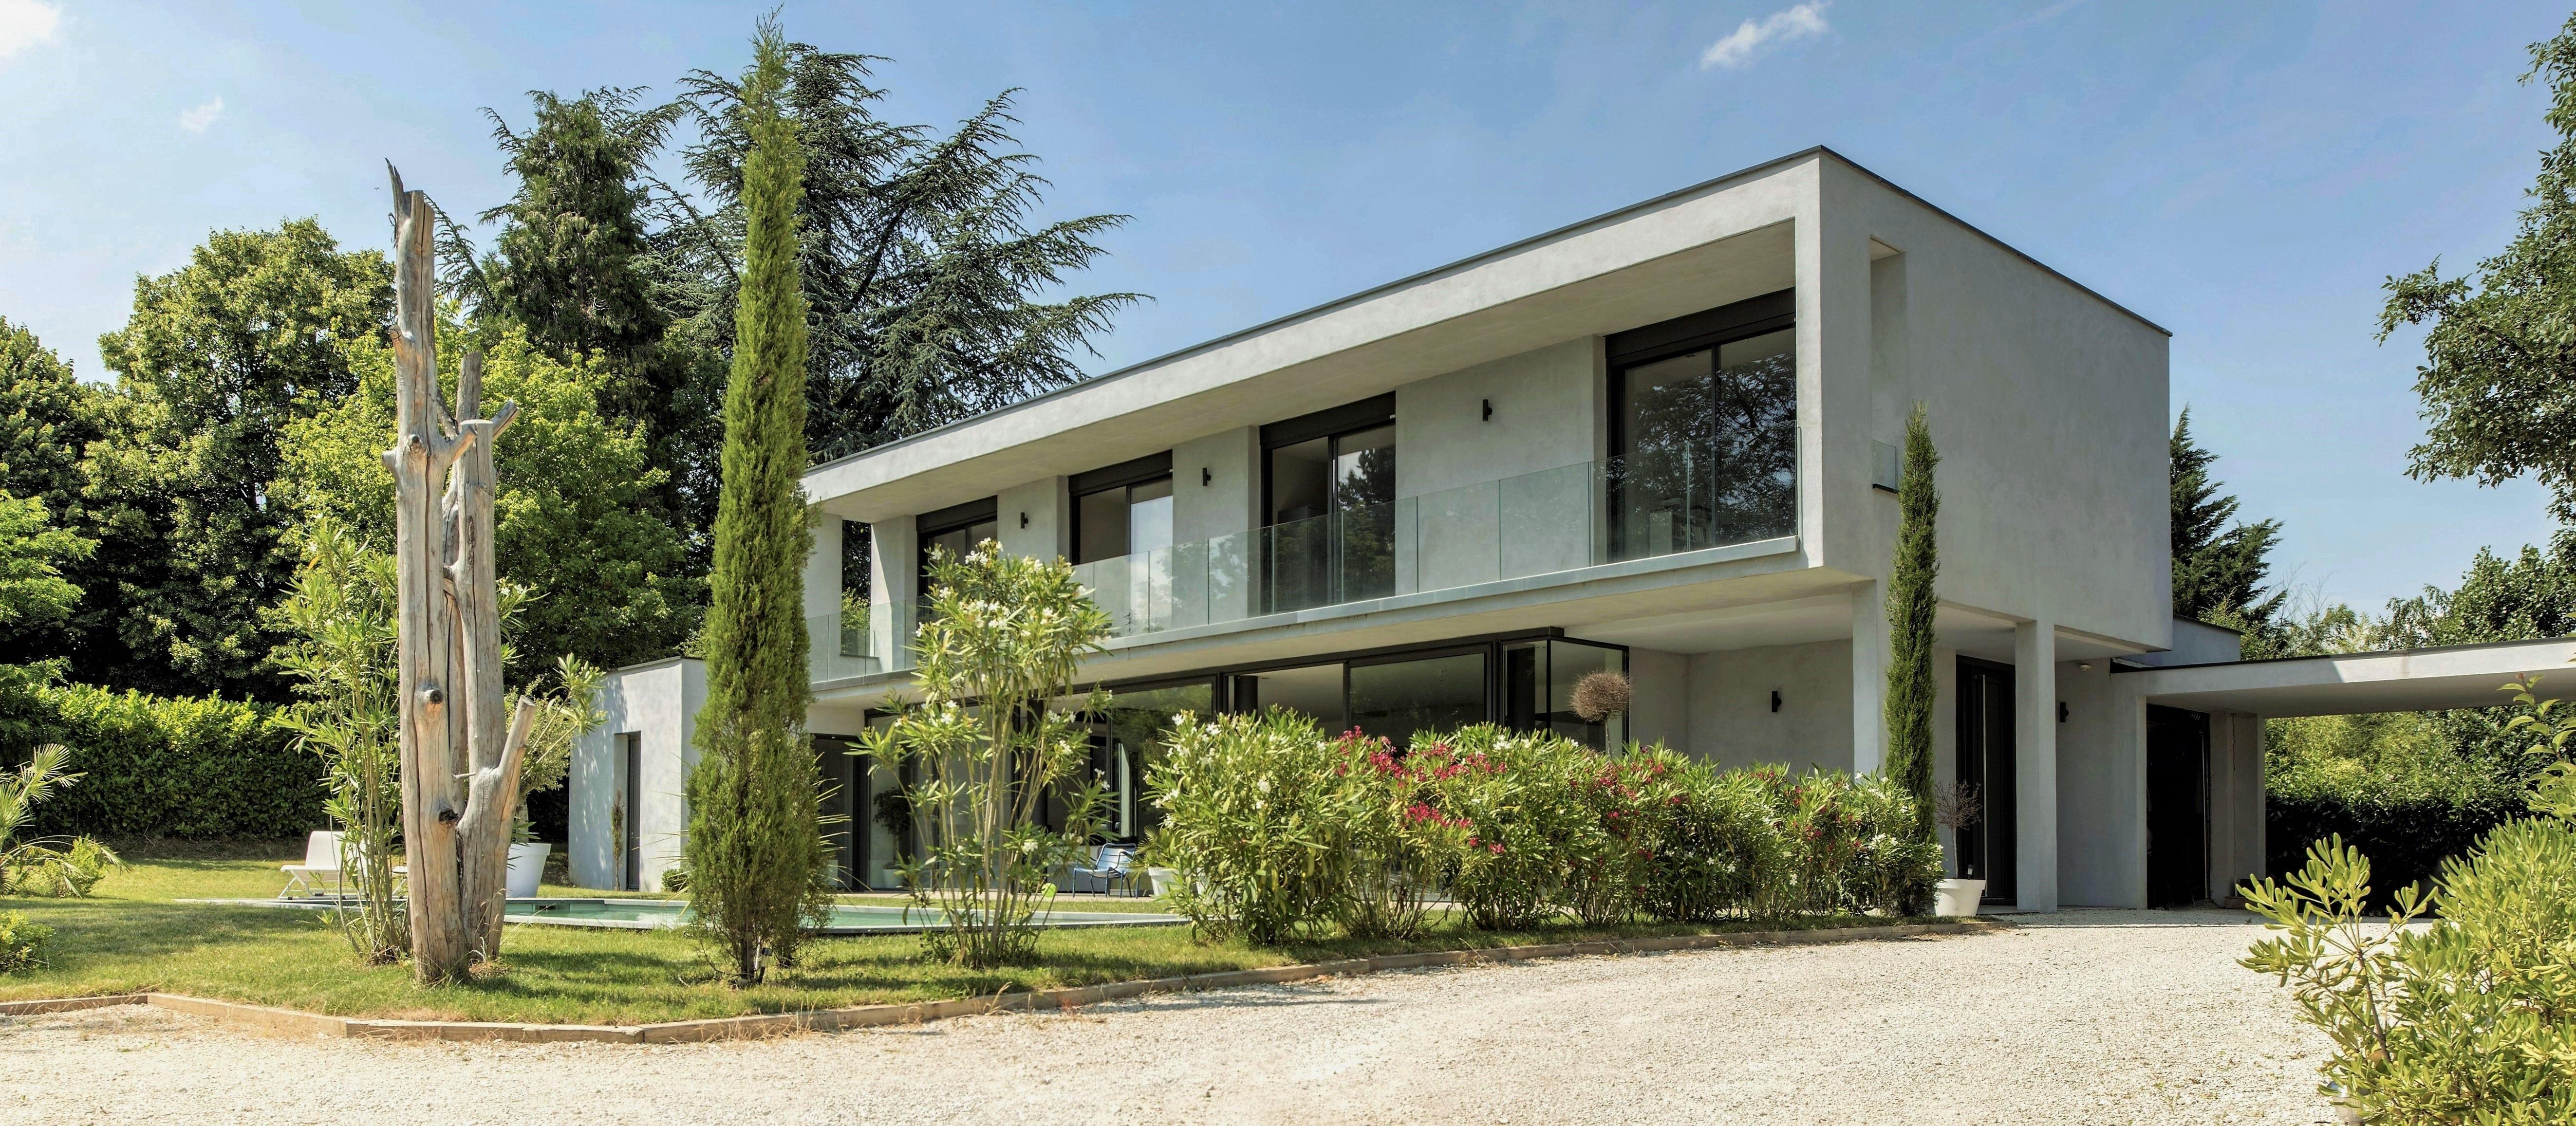 Maison moderne architecte plan maison moderne plain pied for Belle maison moderne architecte